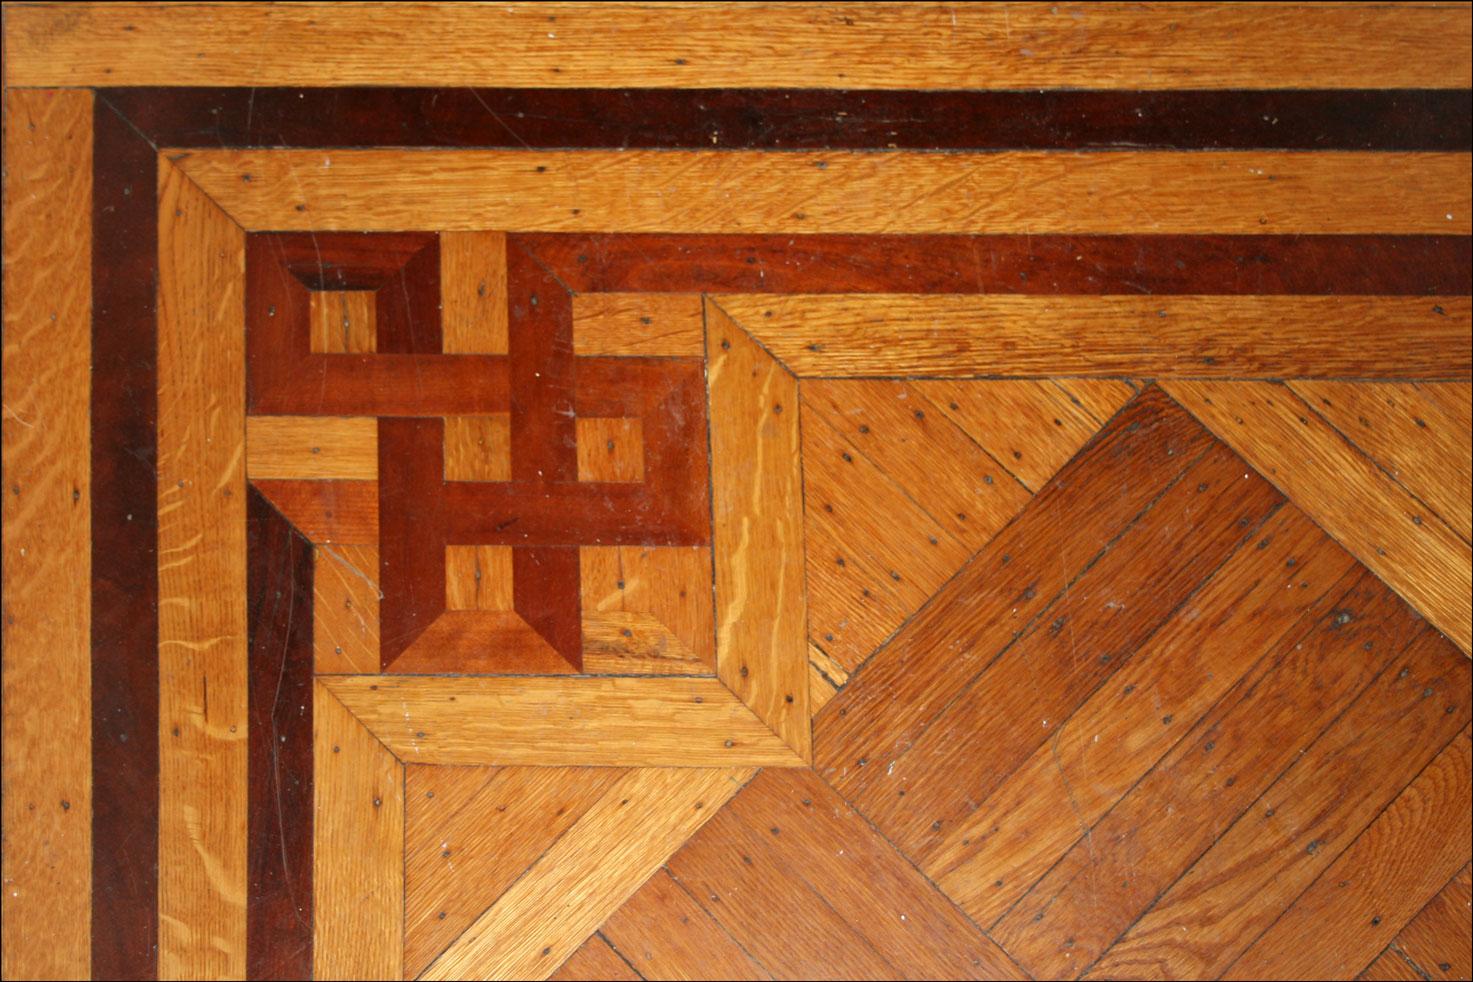 parquet floor http://stephendanko.com/blog/wp-content/uploads/2007/12/allen-st-floor.jpg DMSNJCQ